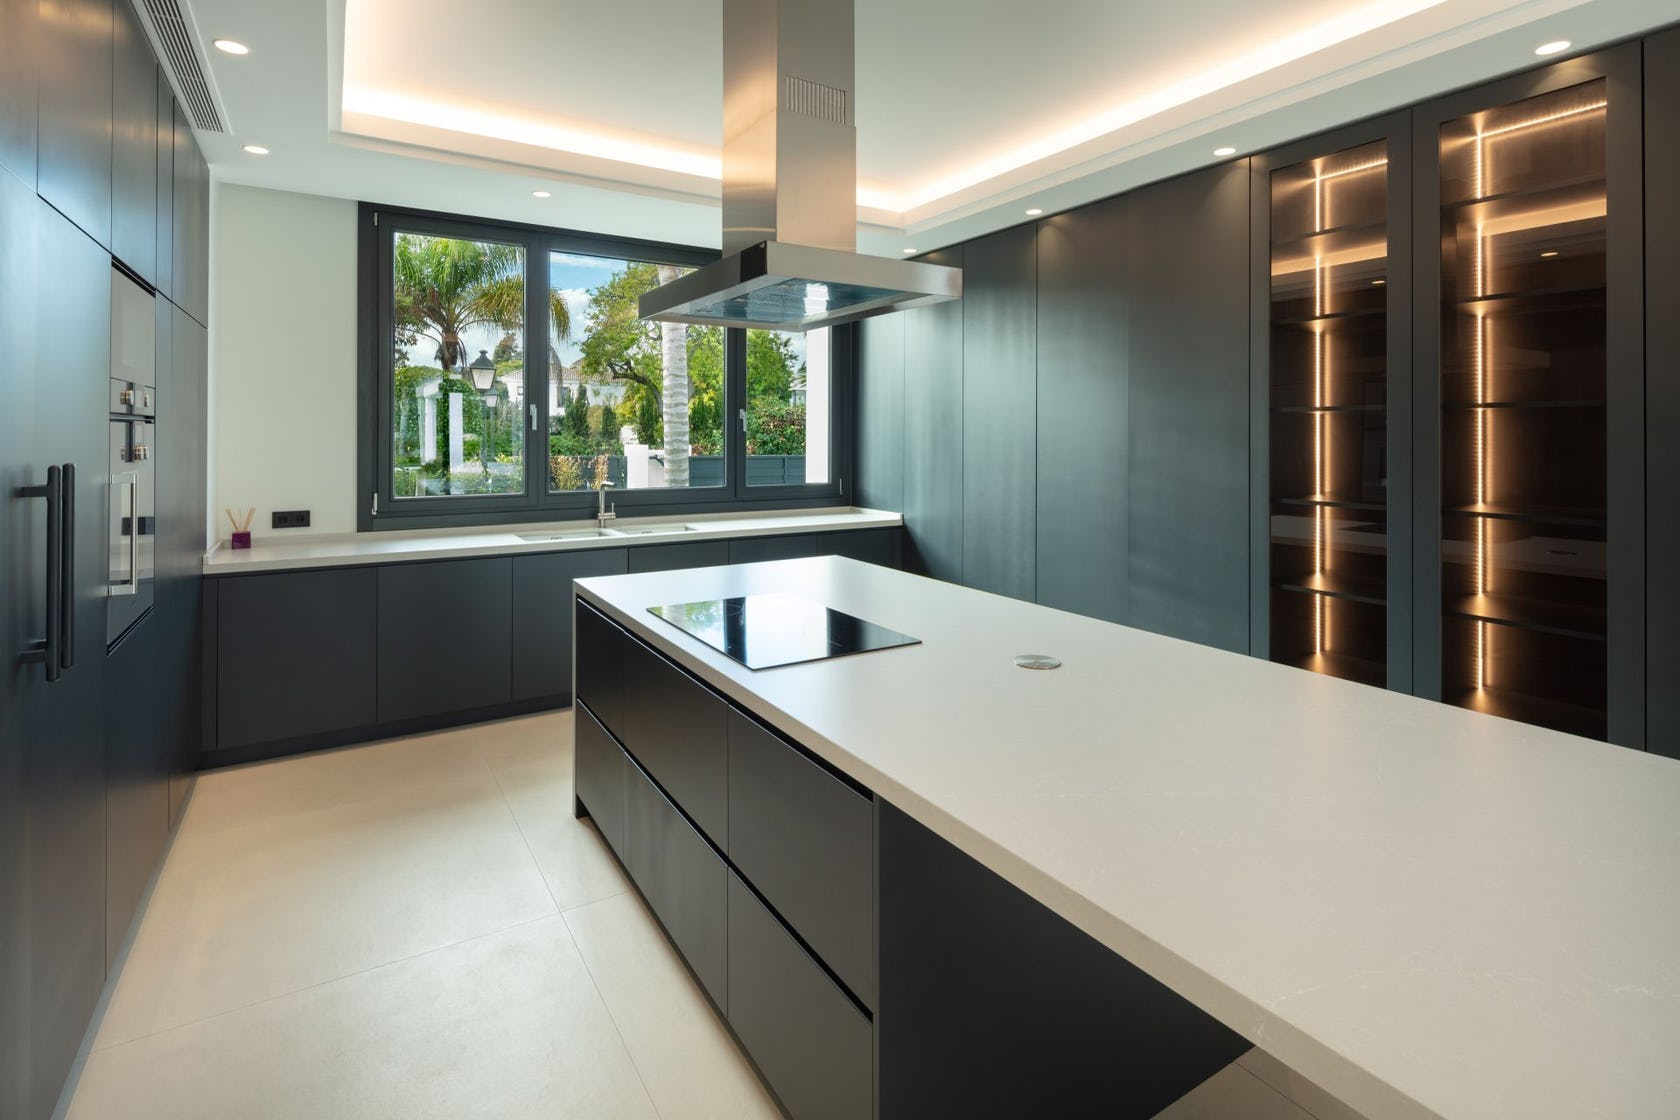 indoors room kitchen island kitchen